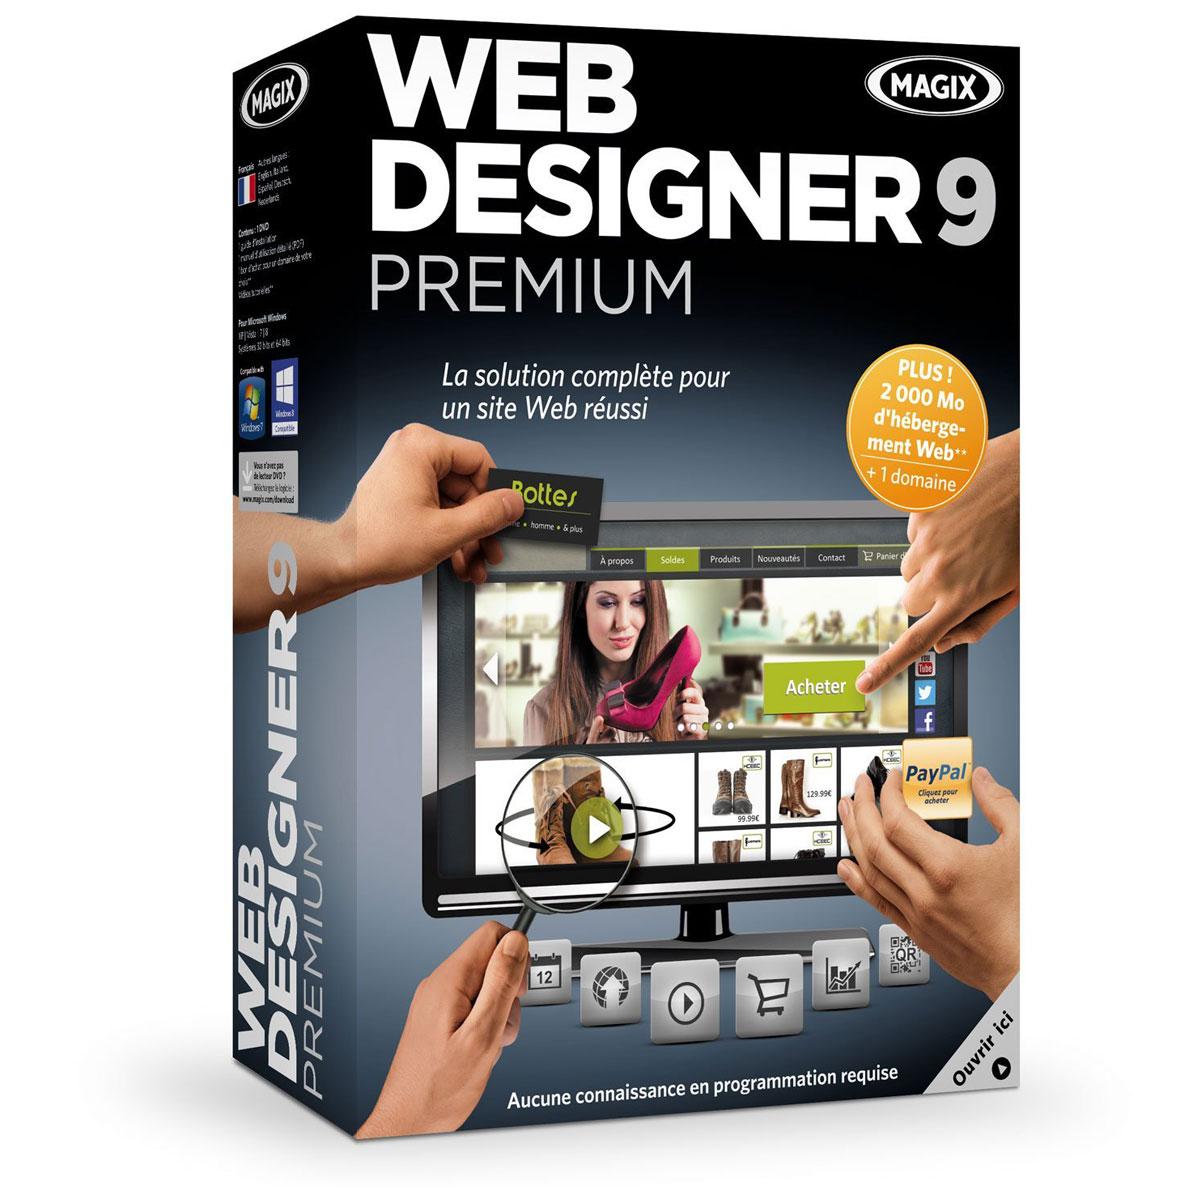 magix web designer 9 premium magix sur. Black Bedroom Furniture Sets. Home Design Ideas